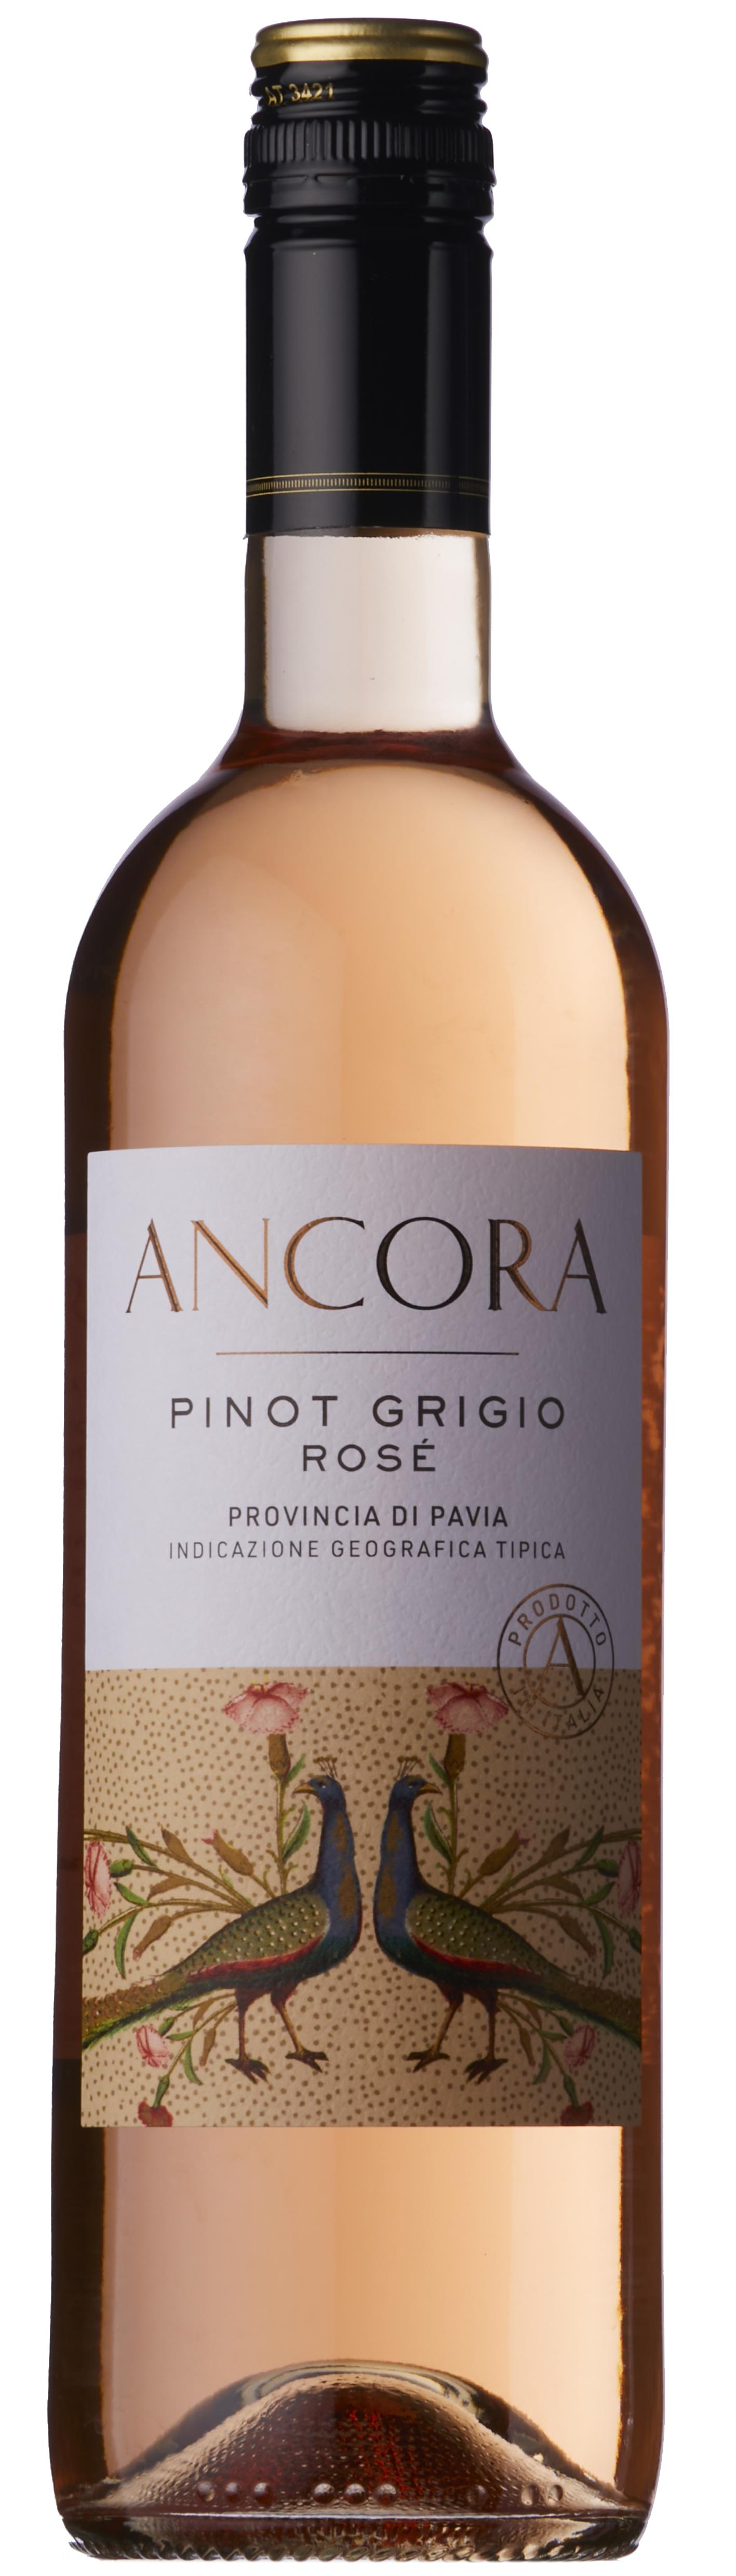 Ancora Pinot Grigio Rose